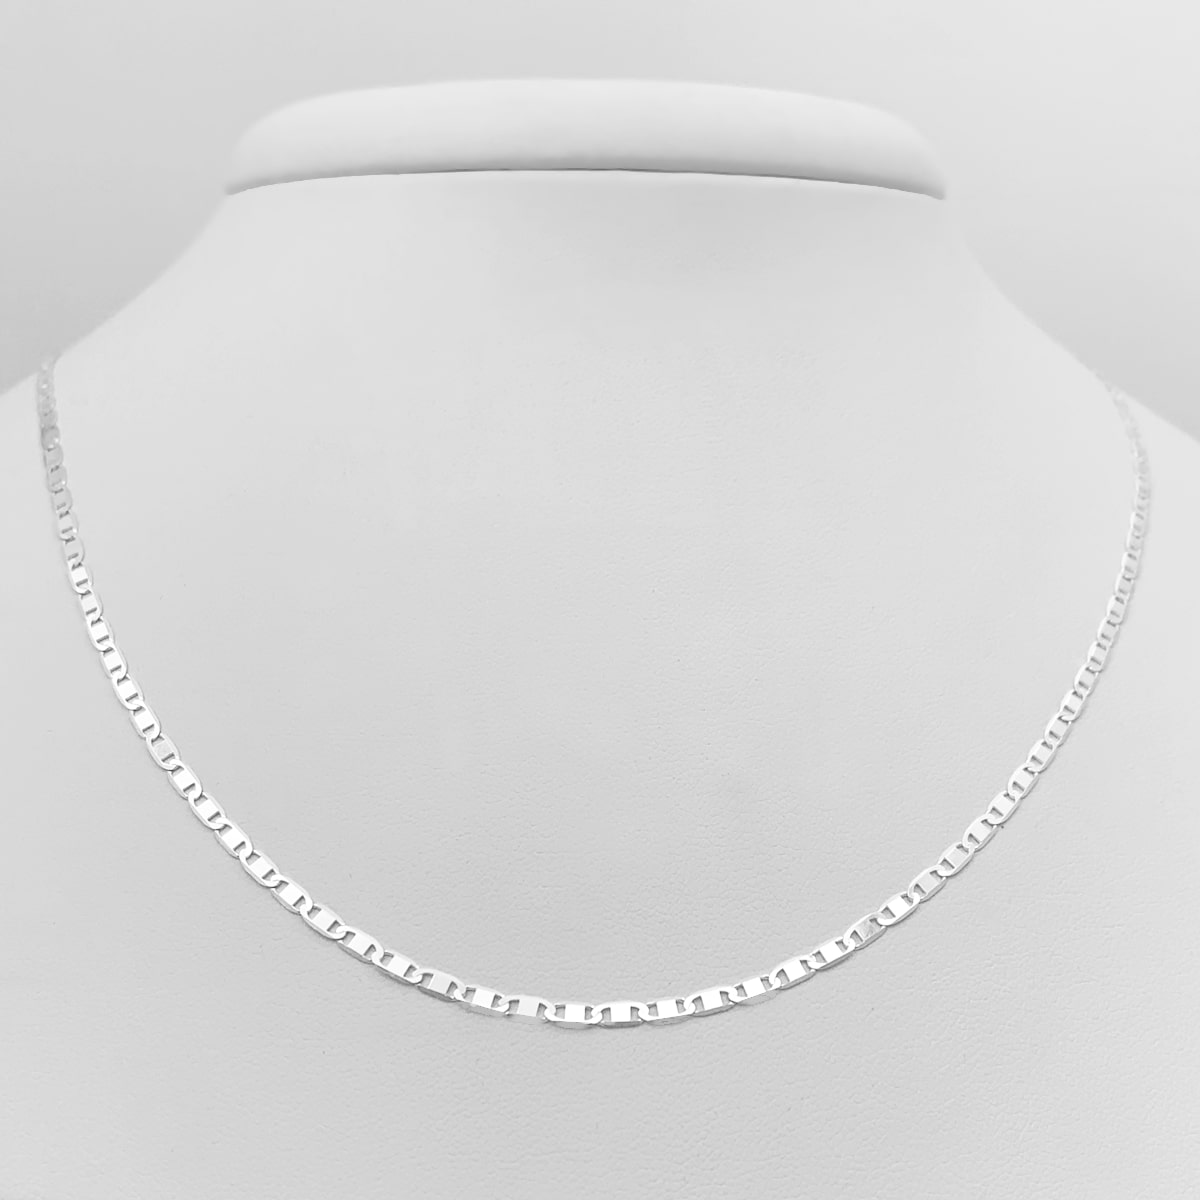 Corrente de Prata 925, Modelo Piastrina